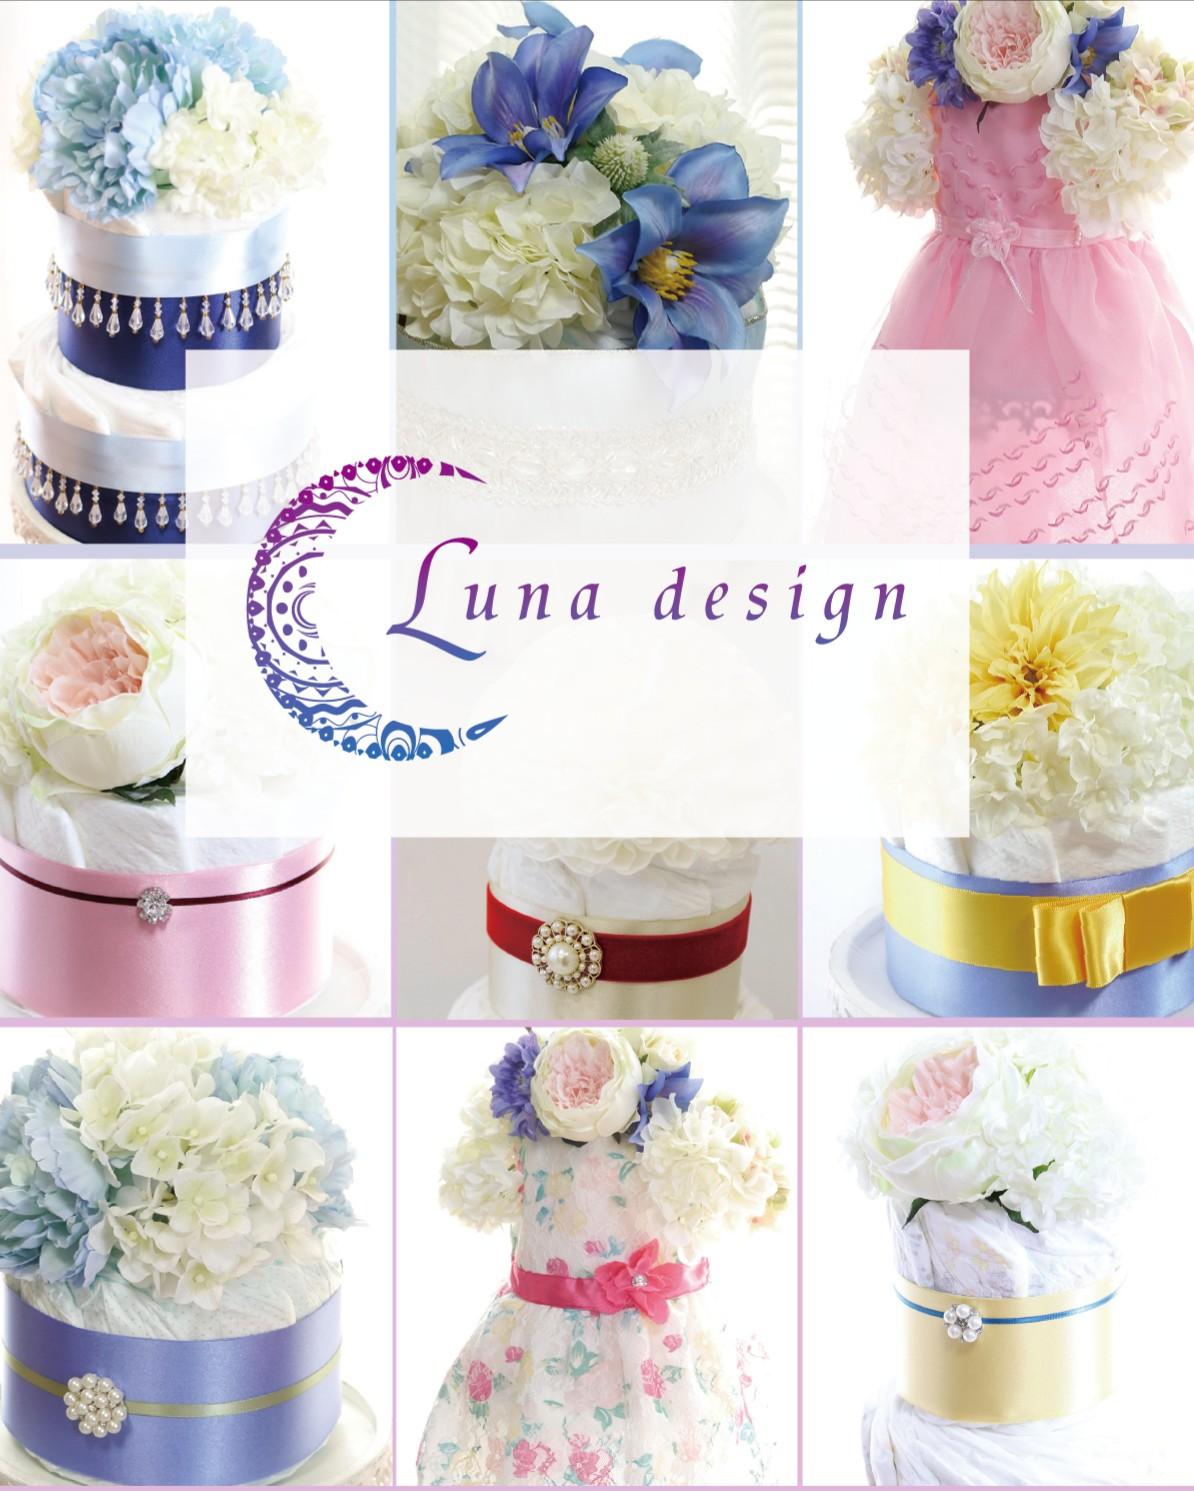 Luna Design /ルナ デザイン 【ダイパーケーキ&ベビーシャワー】